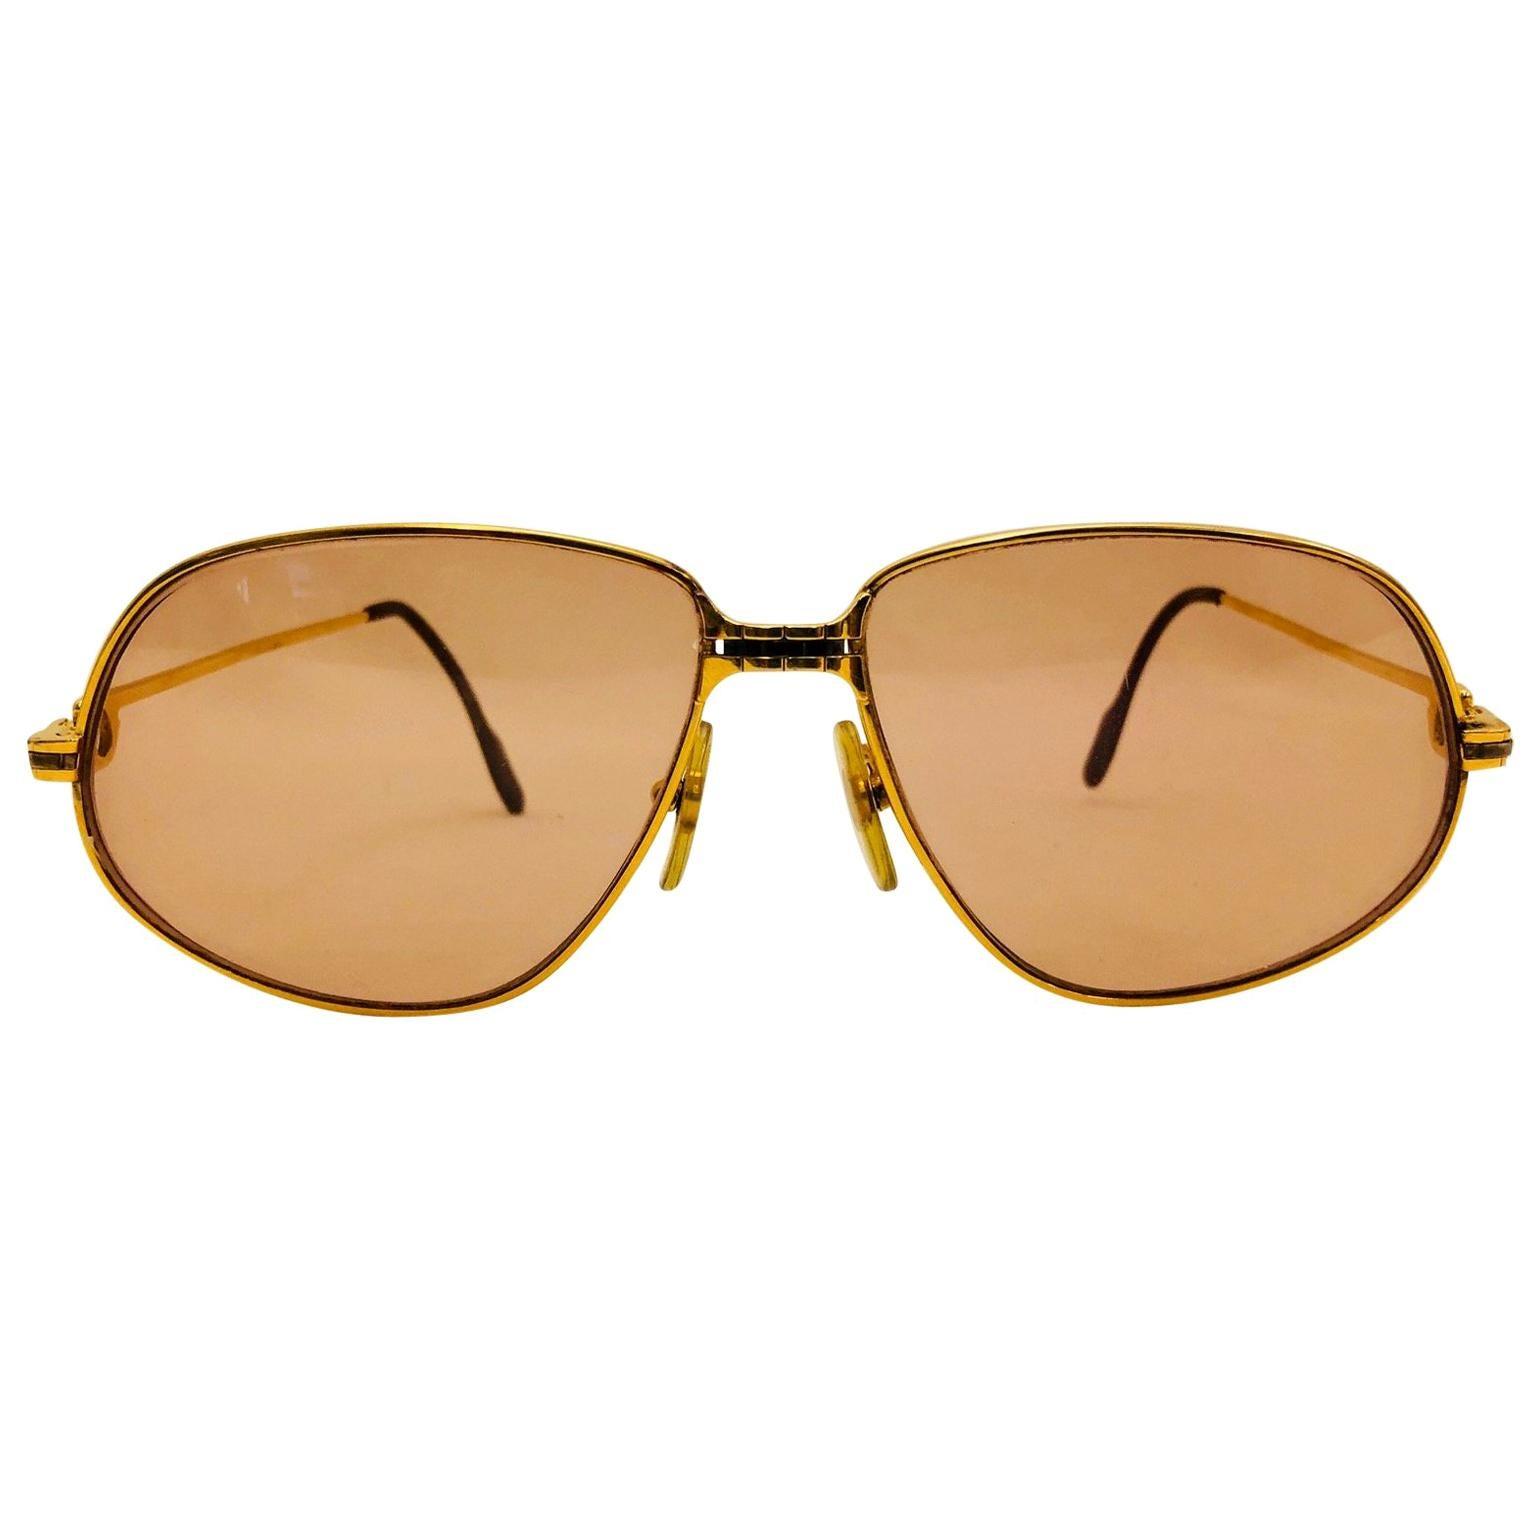 Cartier Vintage Panthere GM Sunglasses 59 14, 1988